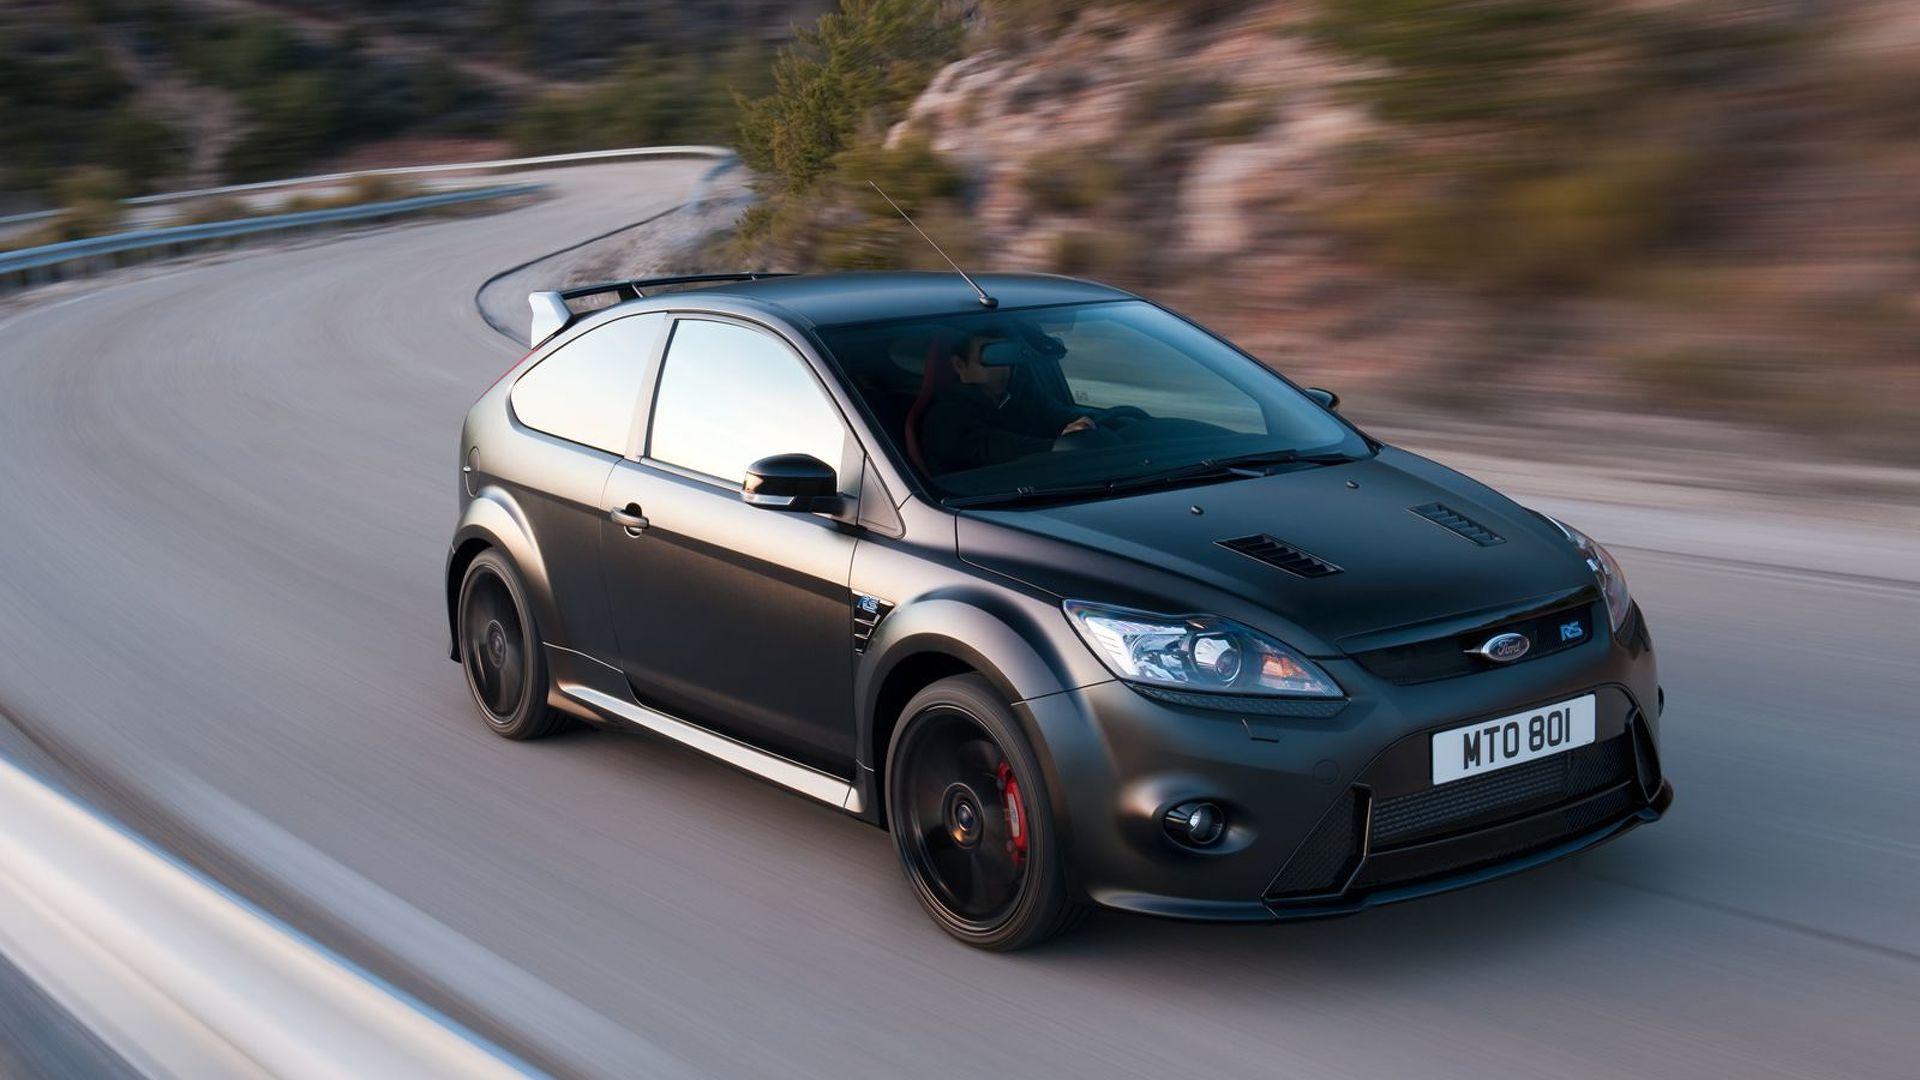 Next-gen Ford Focus RS to get a 350 hp 2.3-liter EcoBoost engine ...